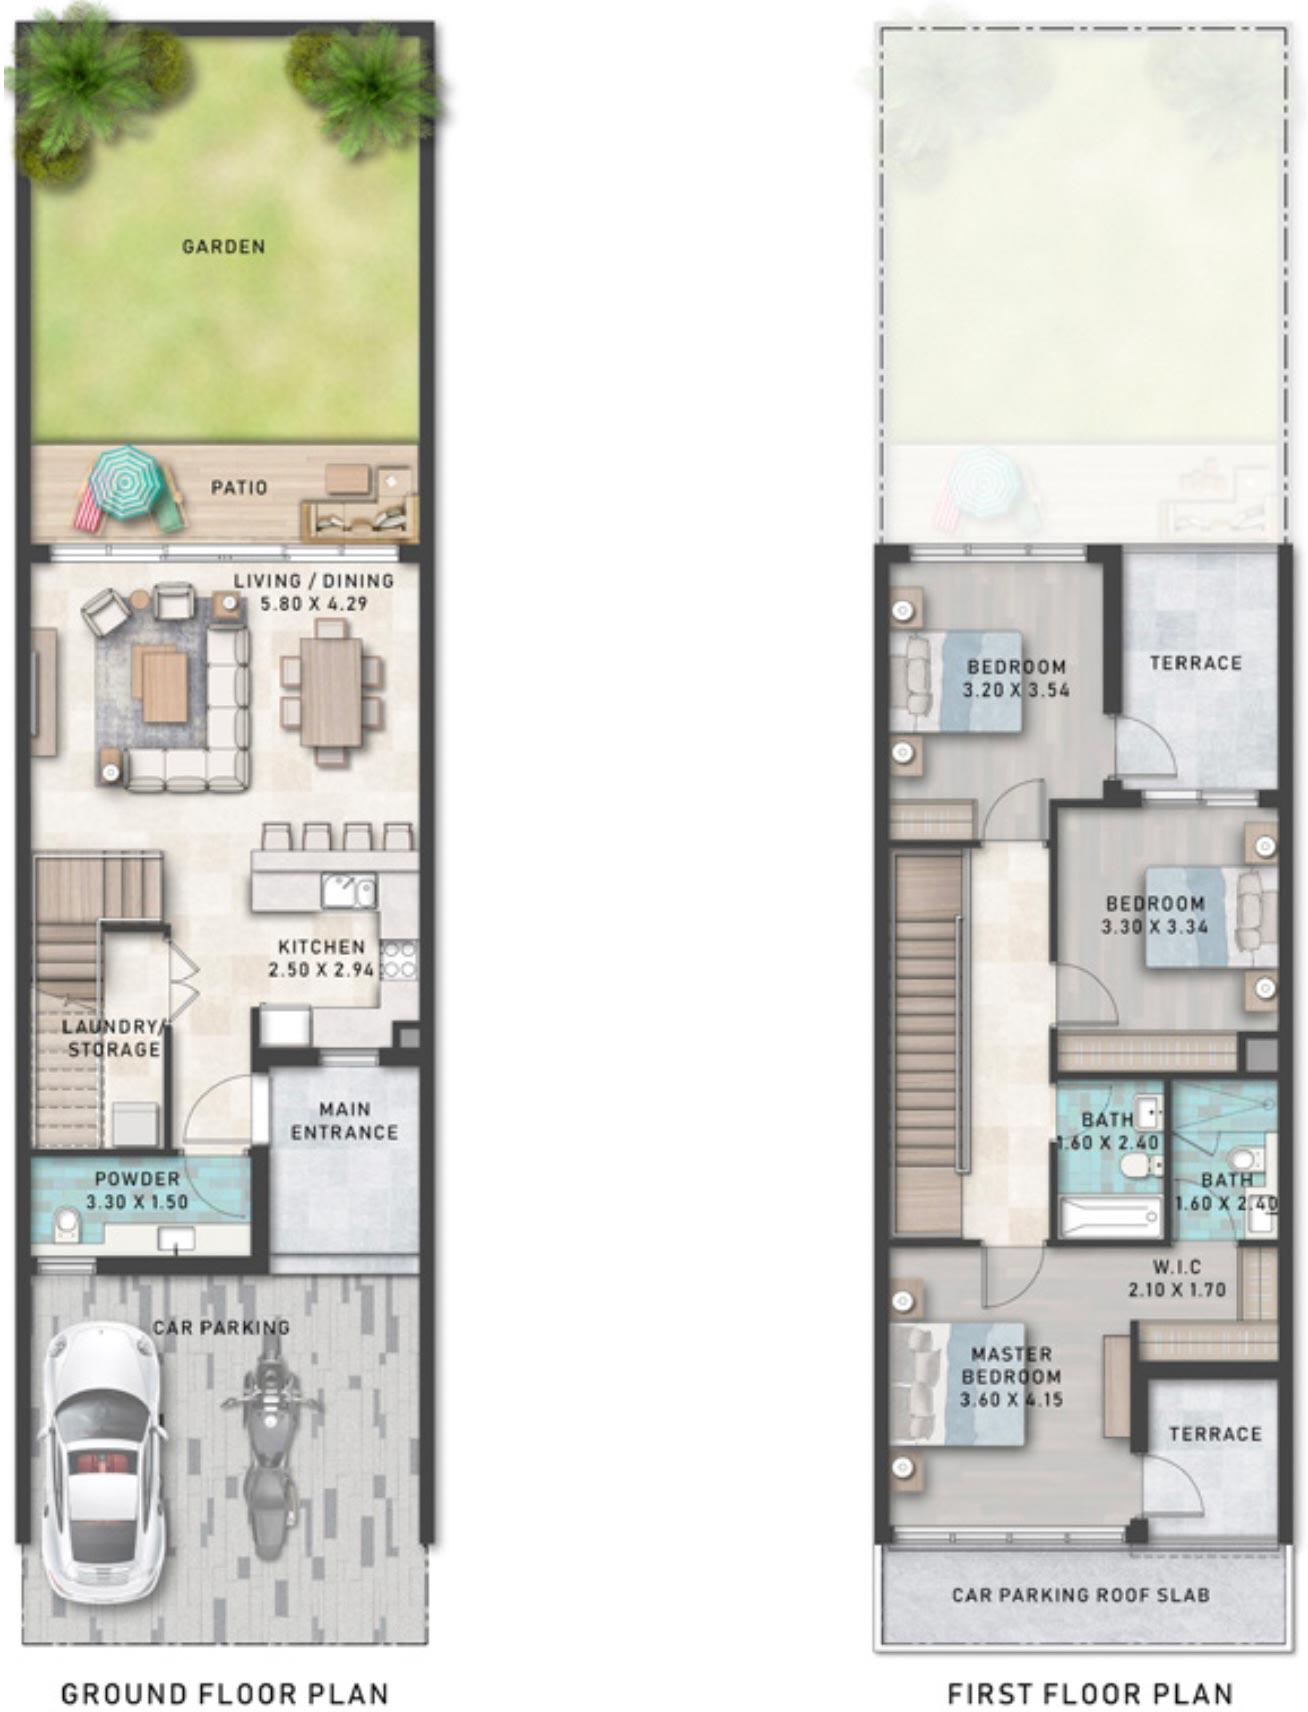 Floor Plans of DAMAC Lagoons Townhouses